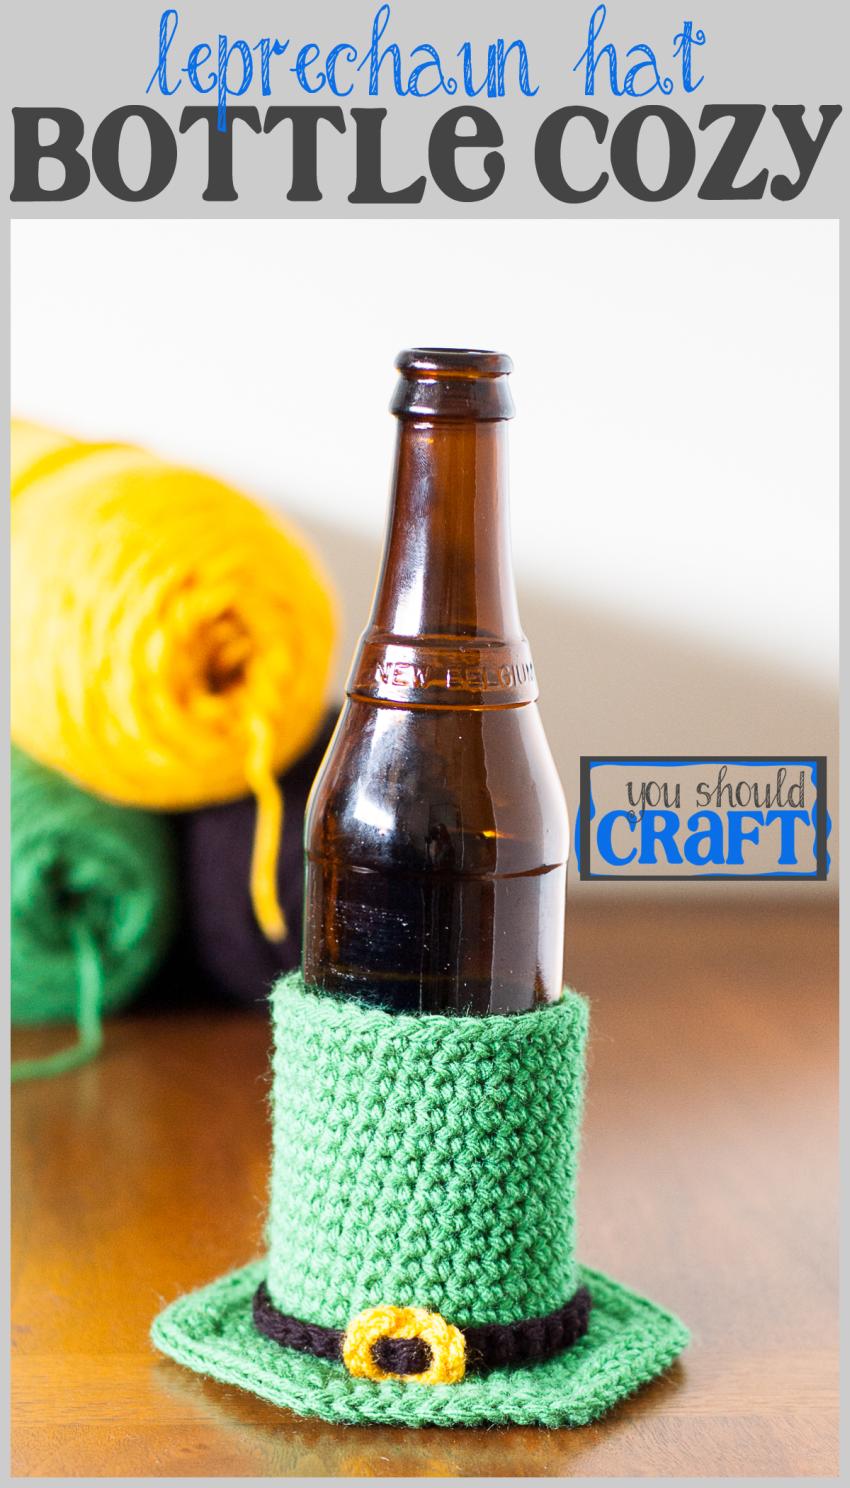 Leprechaun Hat Beer Cozy - Free Crochet Pattern   Pinterest   Free ...